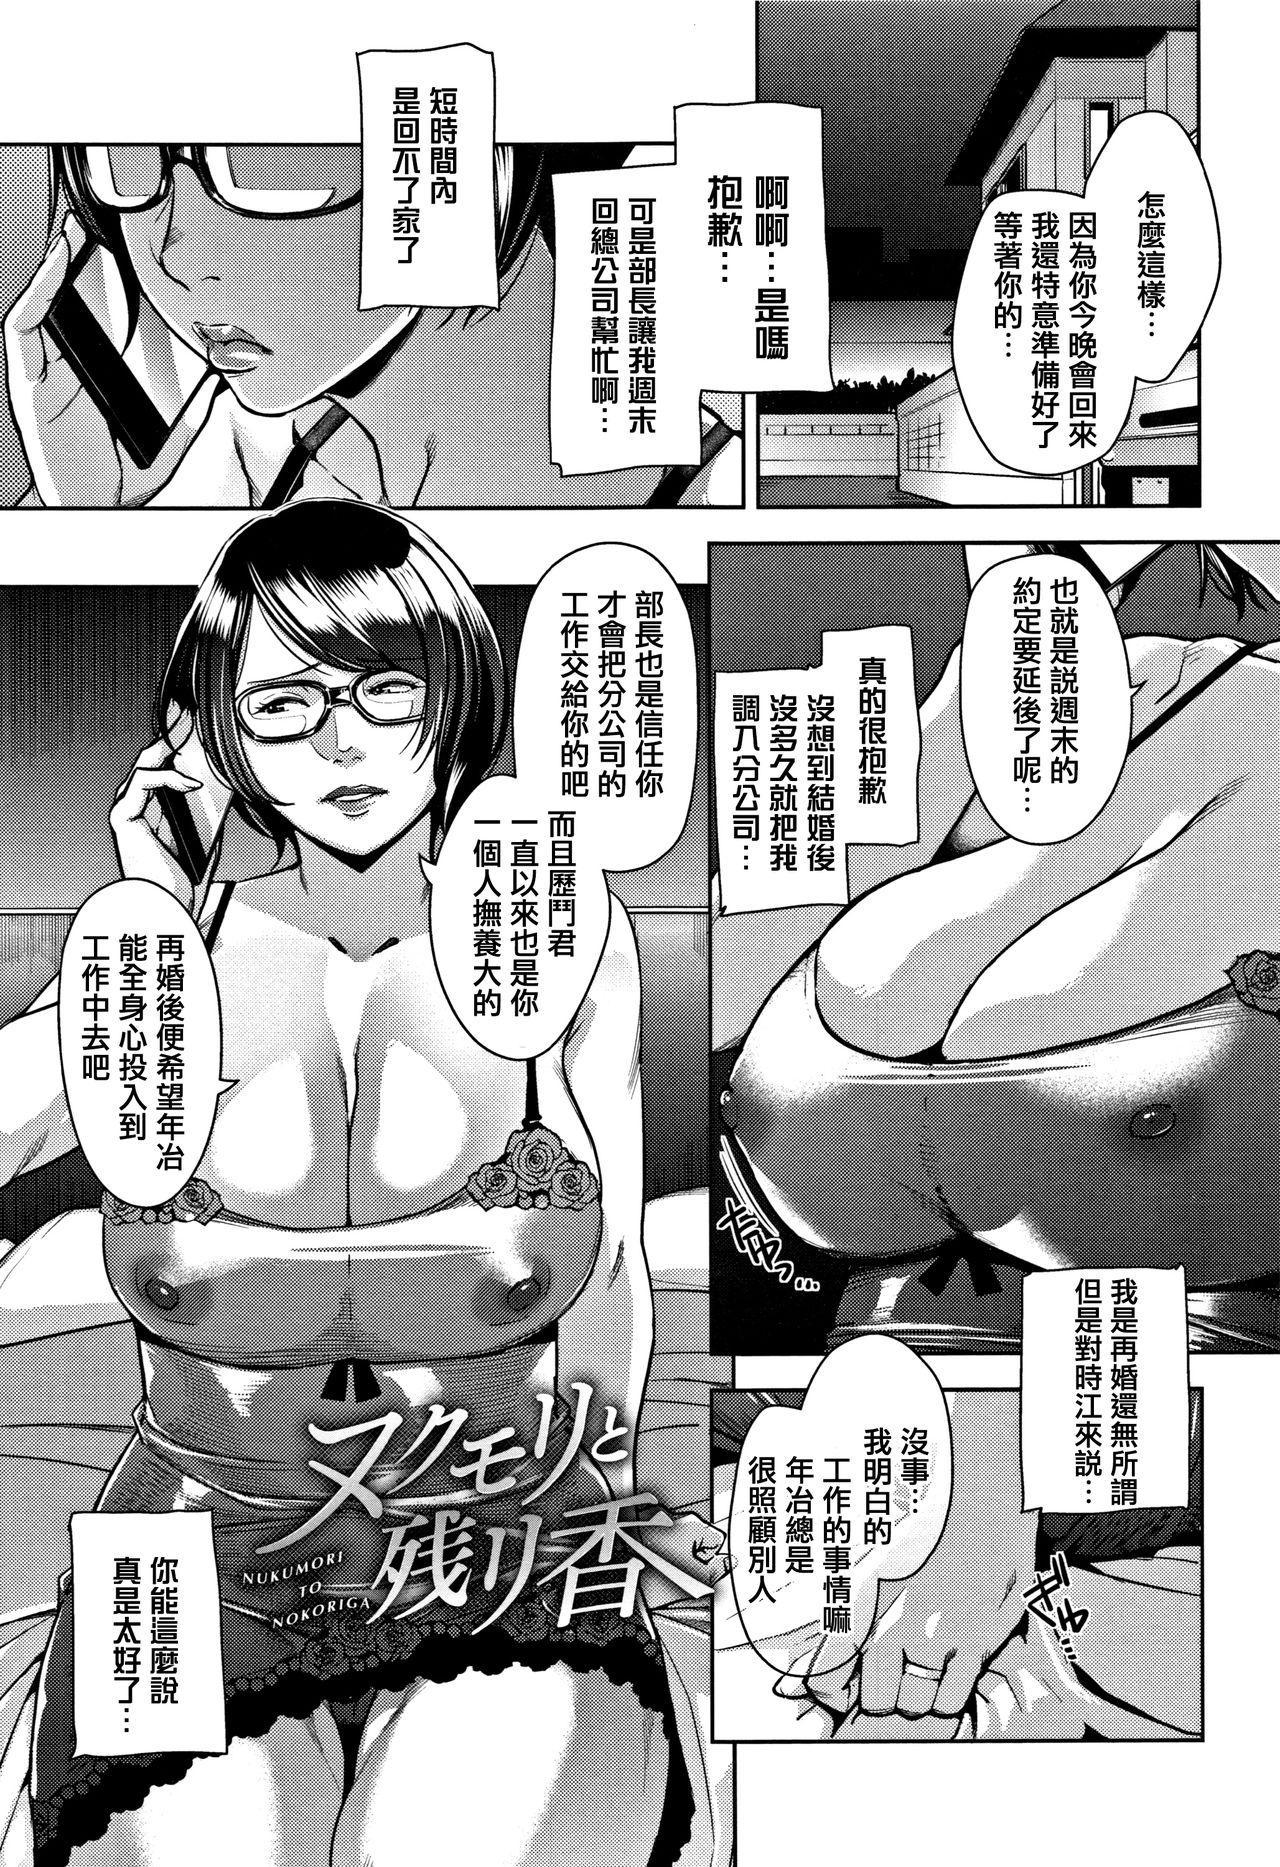 Kanjyuku Chijyo 46